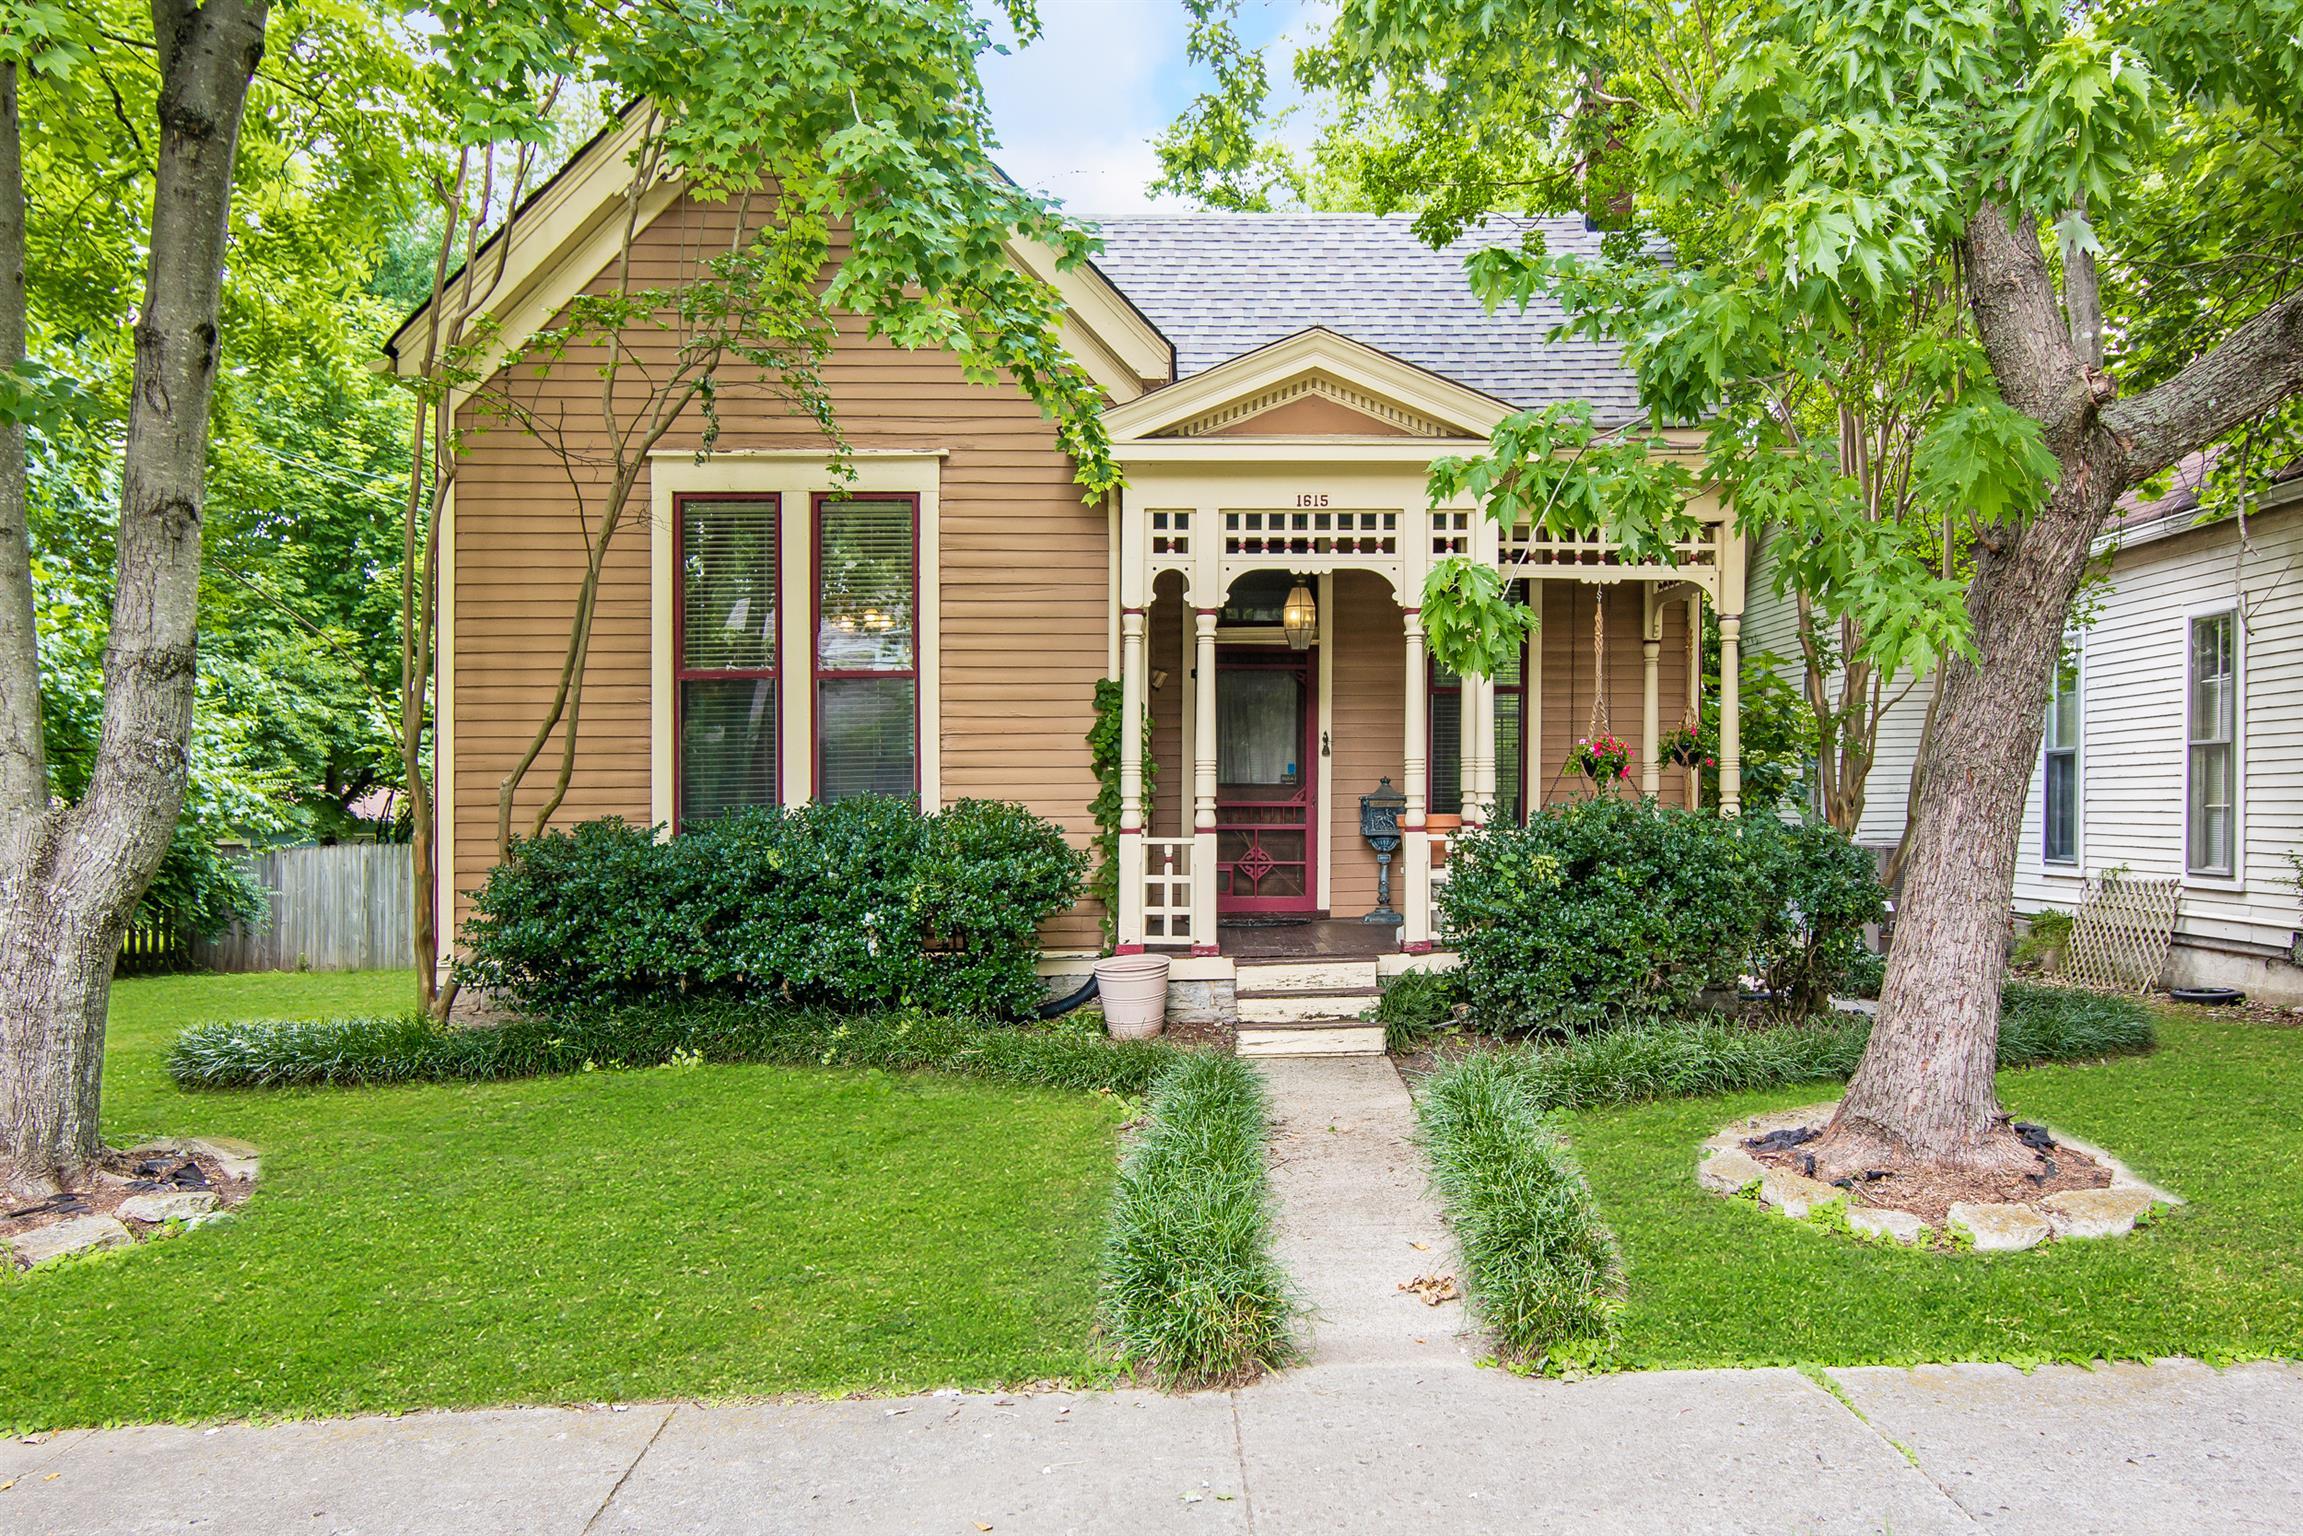 1615 Woodland St, Nashville, TN 37206 - Nashville, TN real estate listing